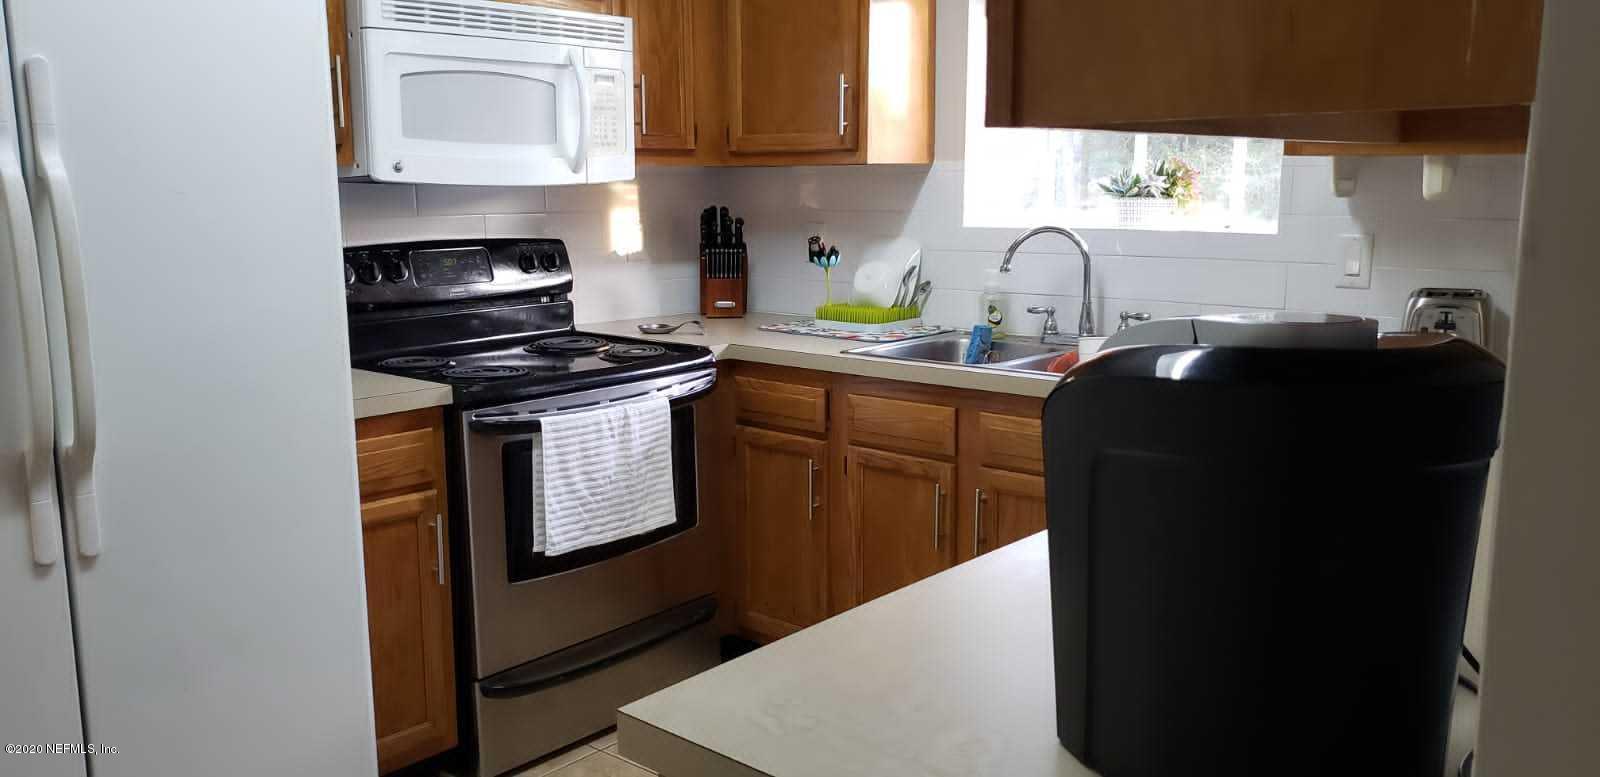 7871 COLLINS RIDGE, JACKSONVILLE, FLORIDA 32244, 3 Bedrooms Bedrooms, ,2 BathroomsBathrooms,Rental,For Rent,COLLINS RIDGE,1082848